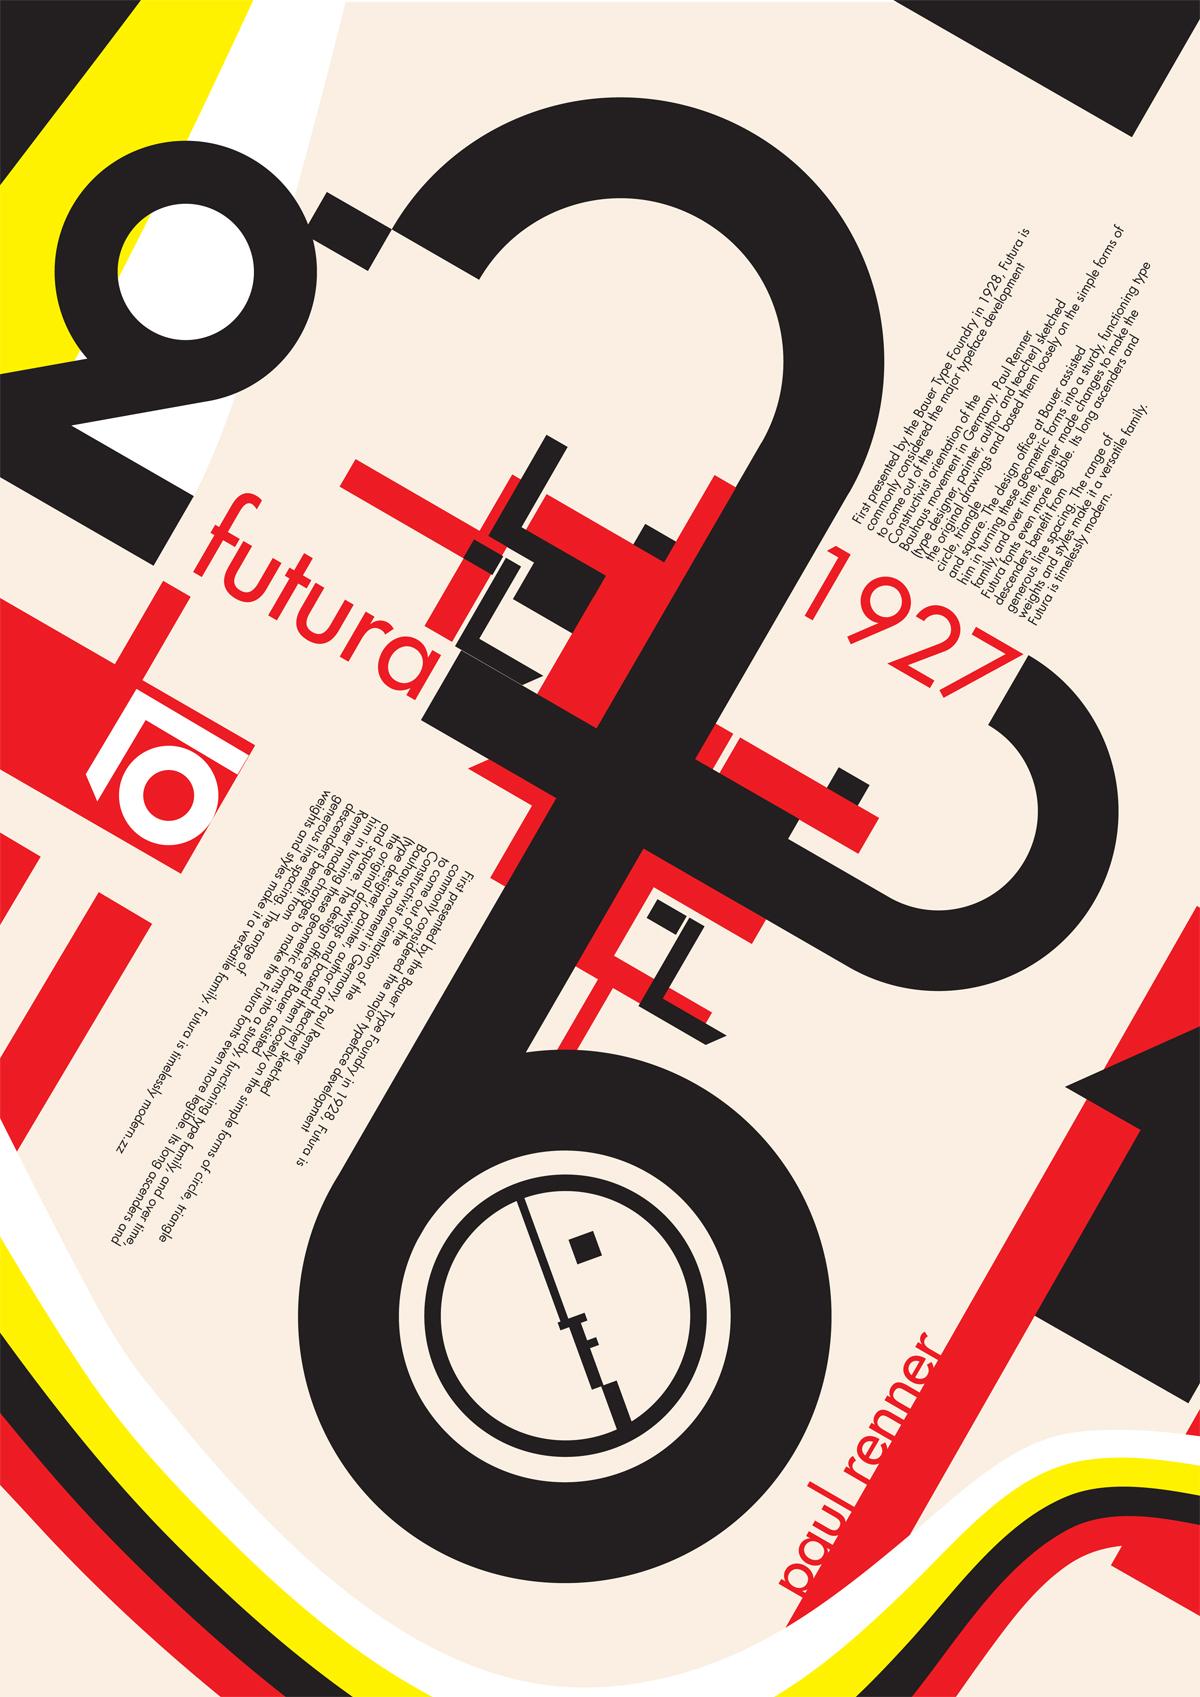 Futura Paul Renner 1927 by max-n0d3